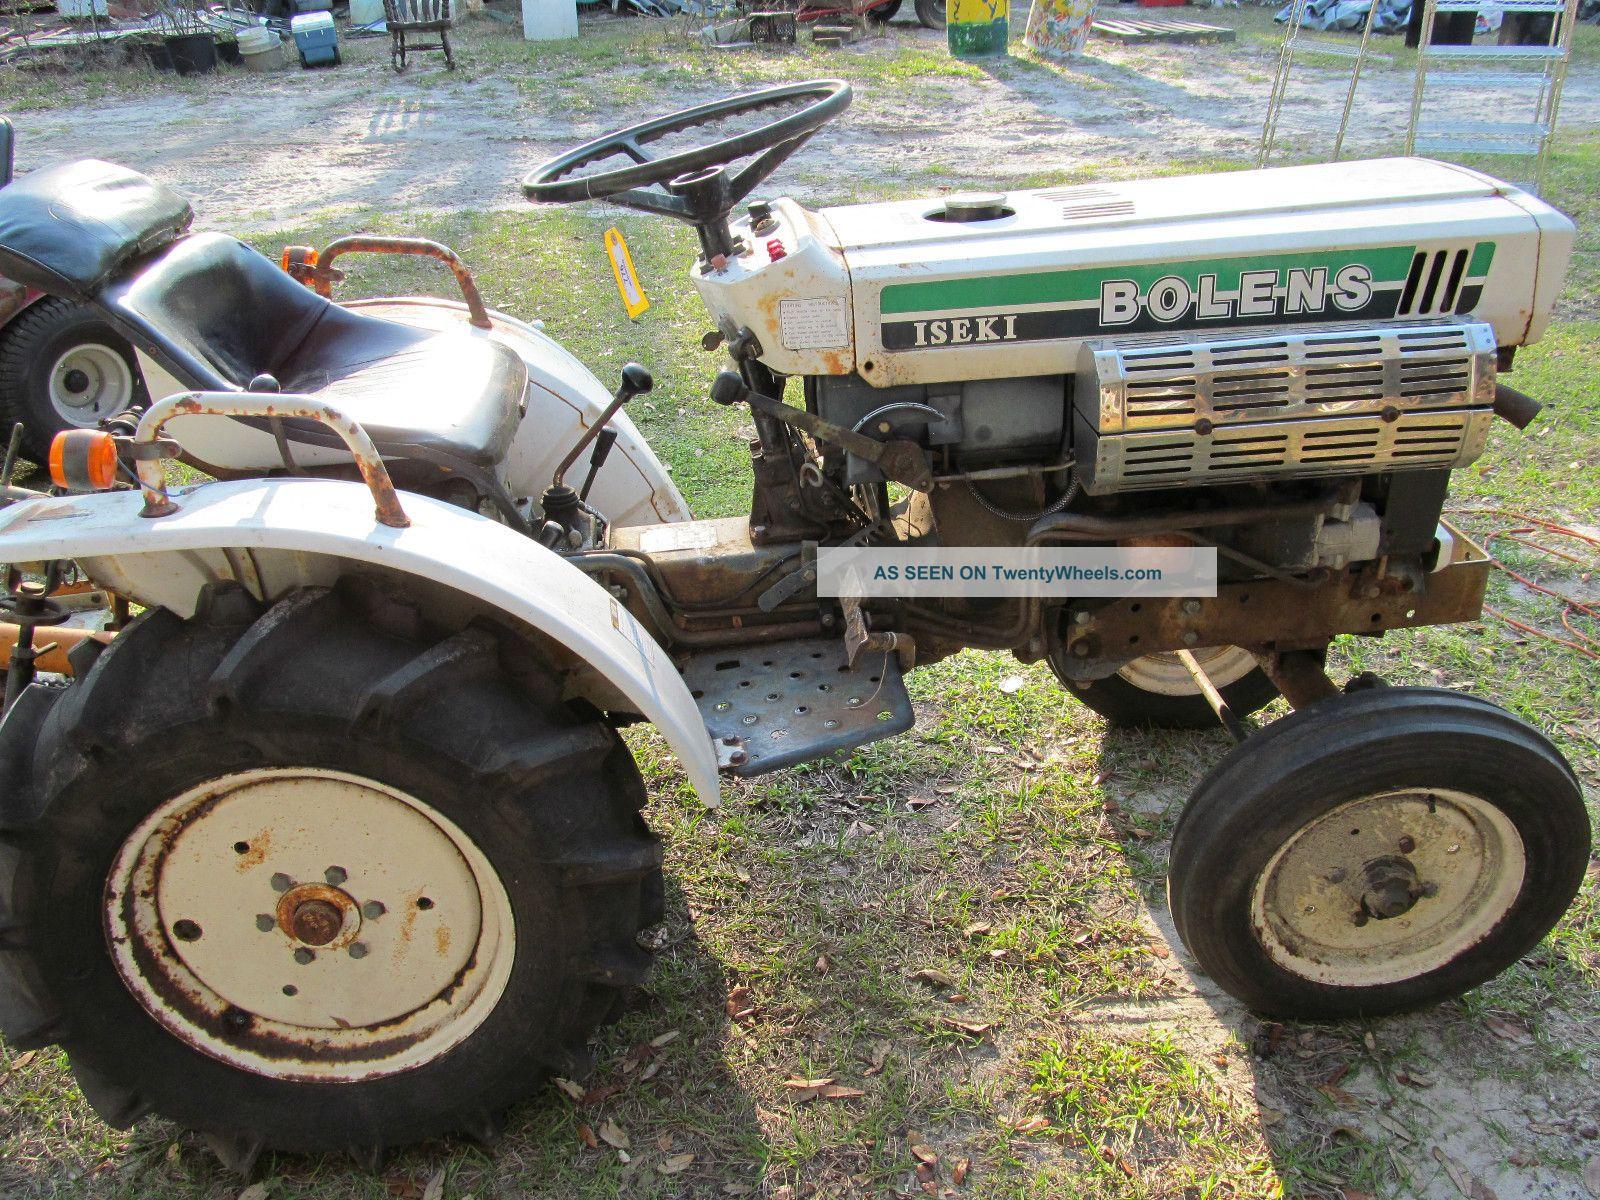 Iseki Tractor Tire Rims : Iseki bolens tractor w woods inch ft finish mower